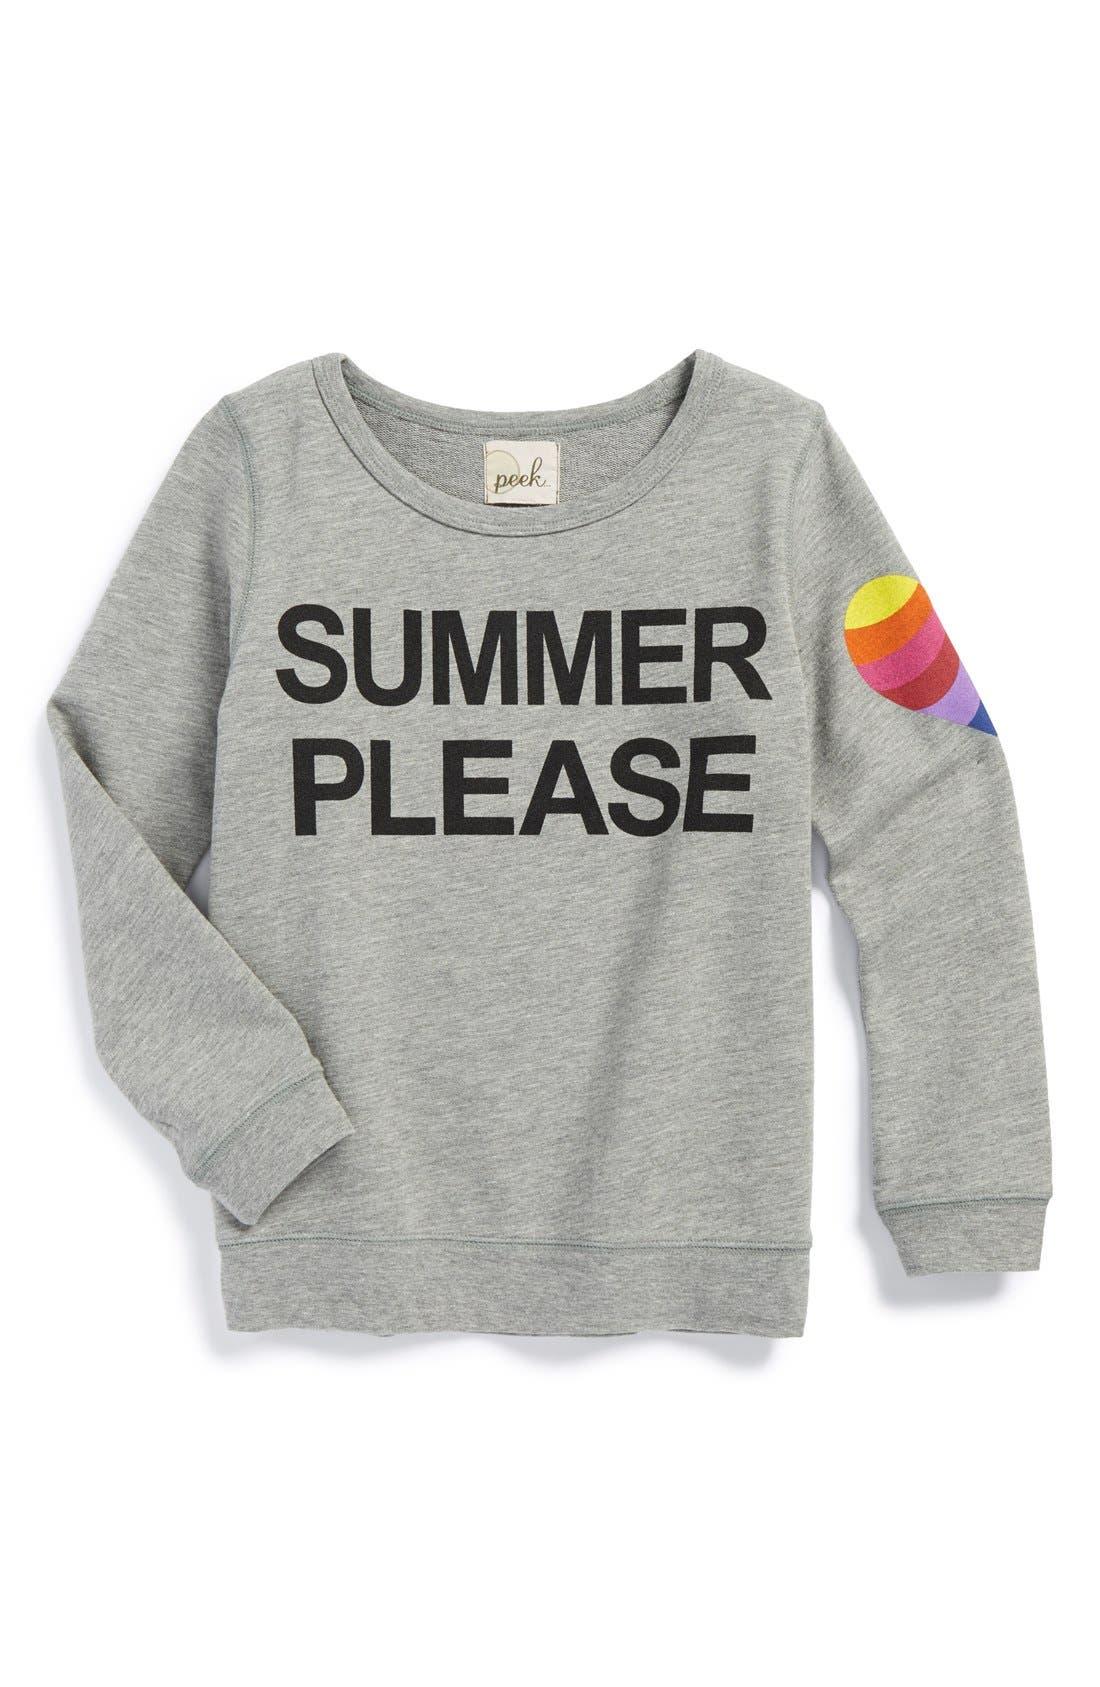 Main Image - Peek 'Summer Please' Graphic Sweatshirt (Toddler Girls, Little Girls & Big Girls)